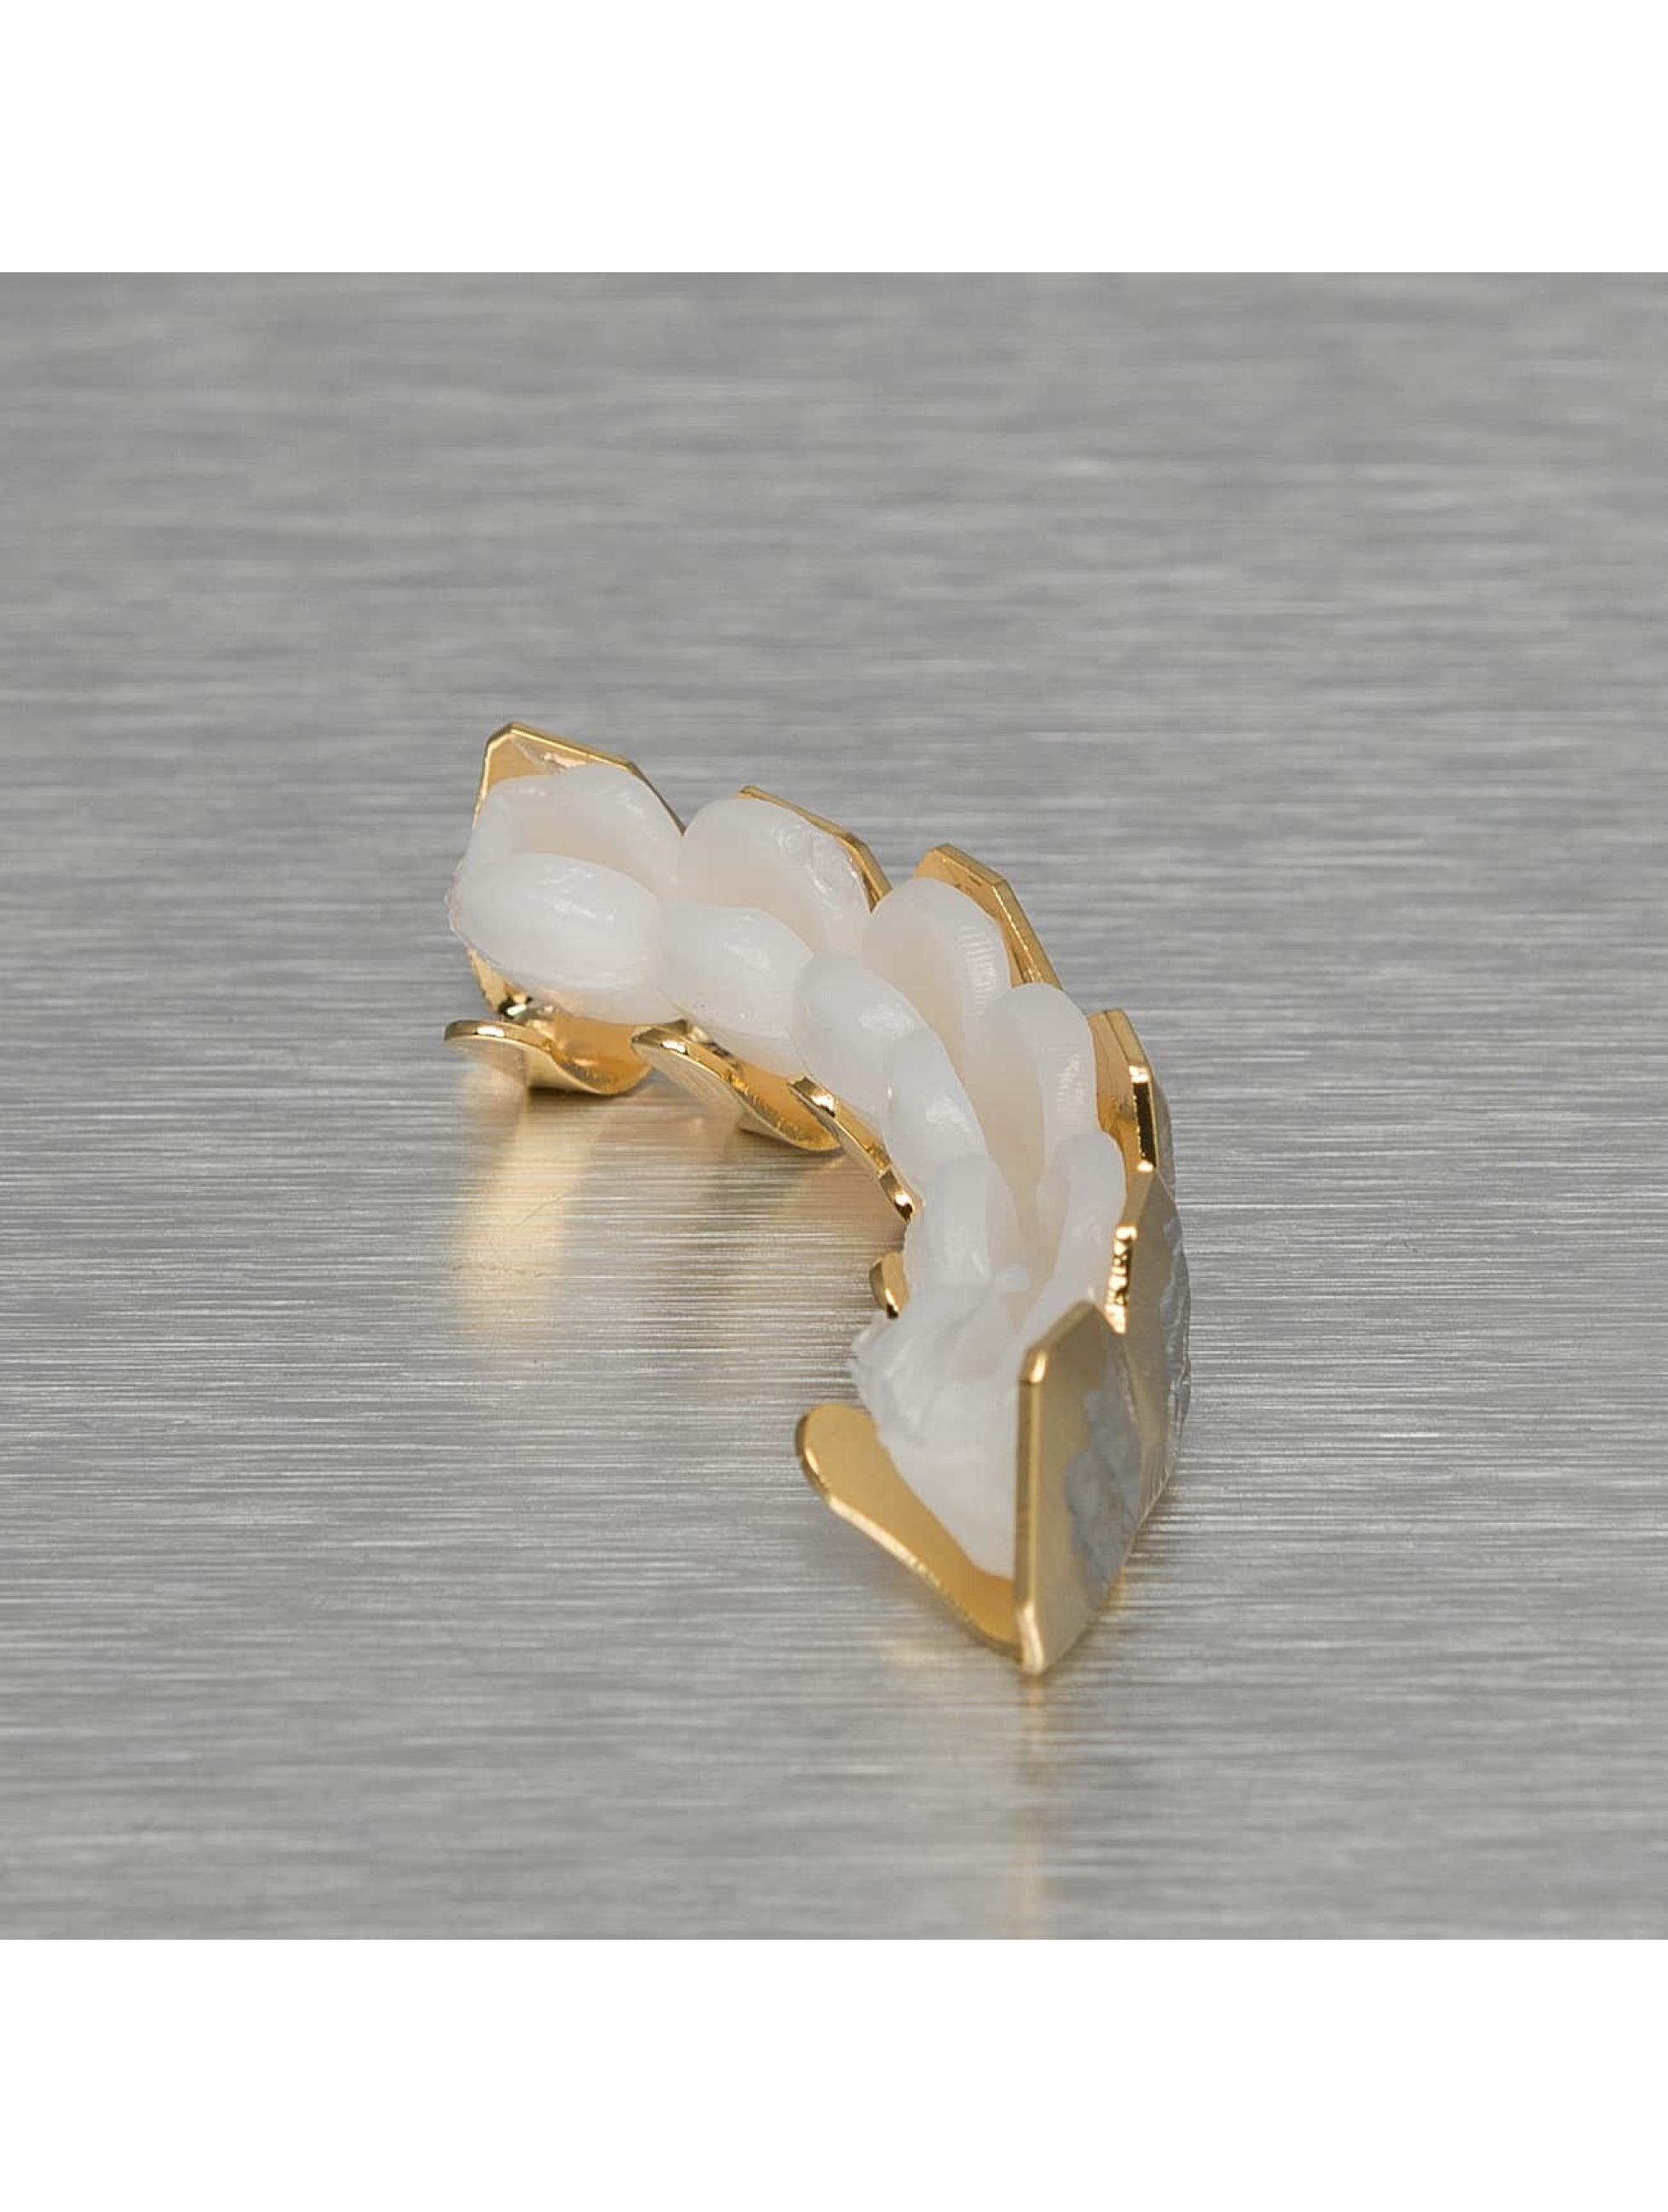 KING ICE Прочее Diamond Cut золото